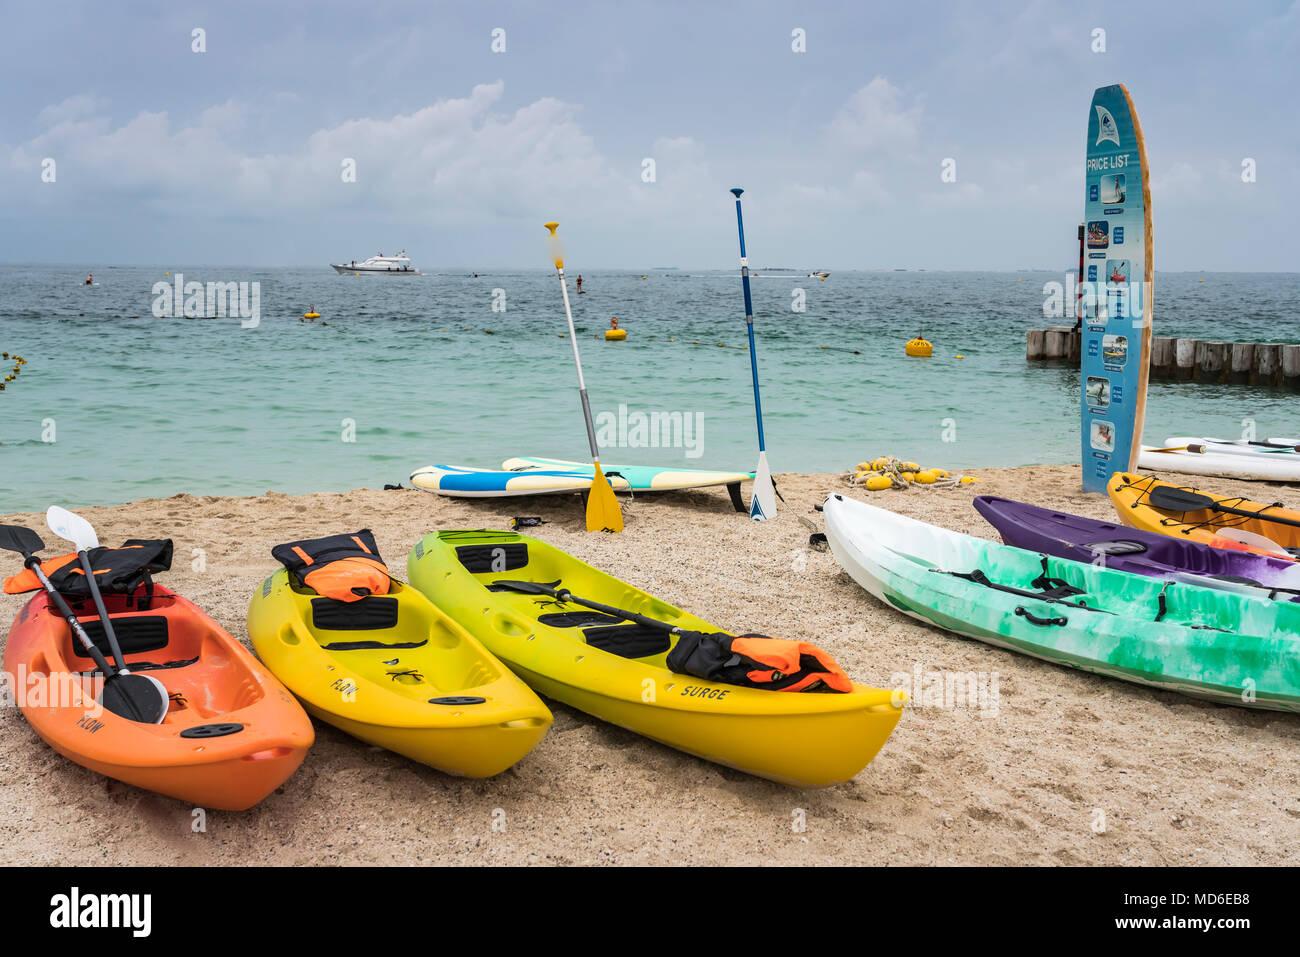 Colorful Kayaks At Kite Beach Dubai Uae Middle East Stock Photo